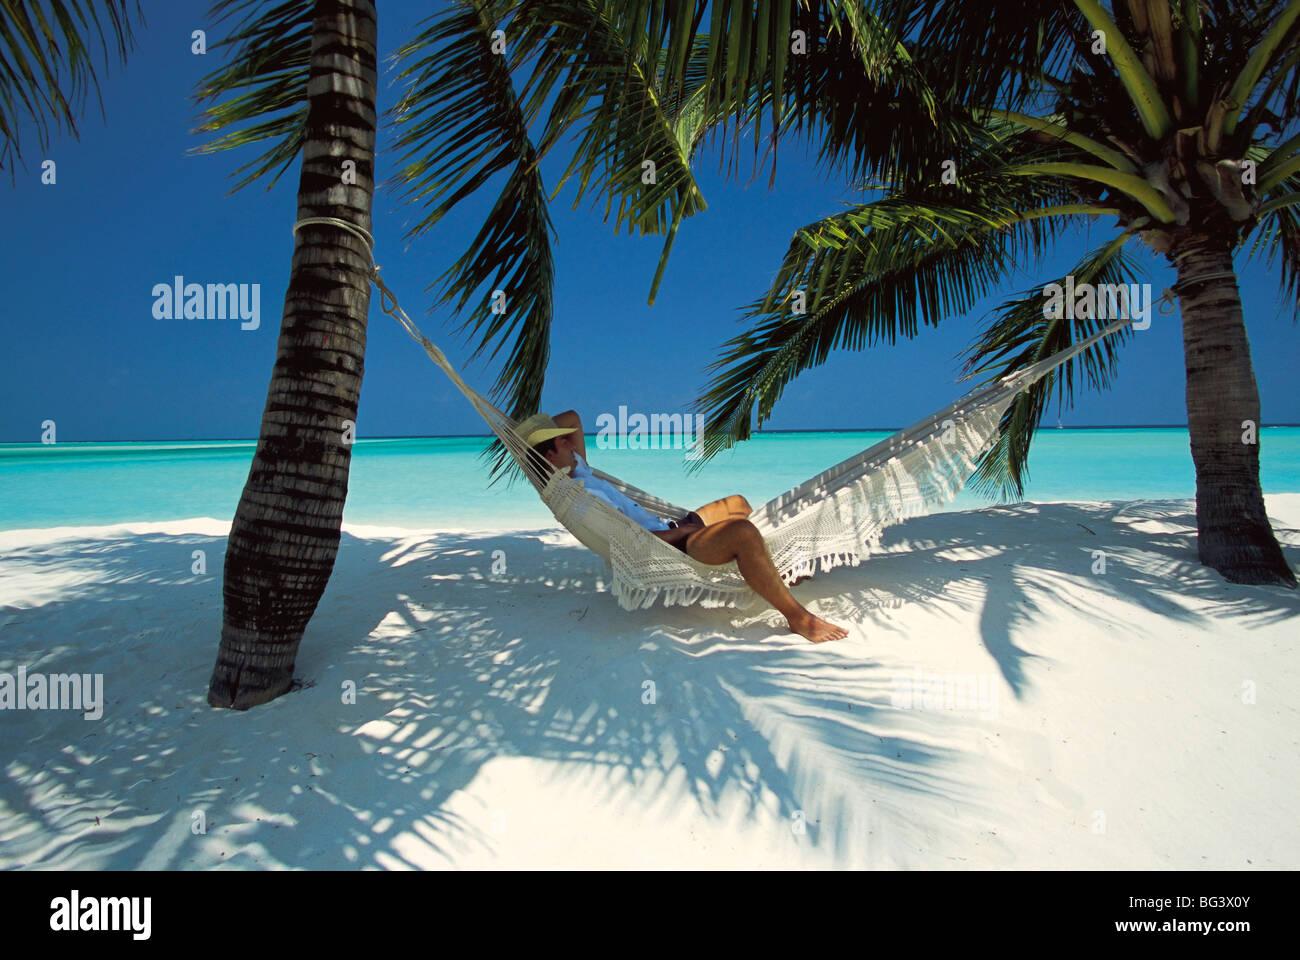 Man relaxing on a beachside hammock, Maldives, Indian Ocean, Asia - Stock Image